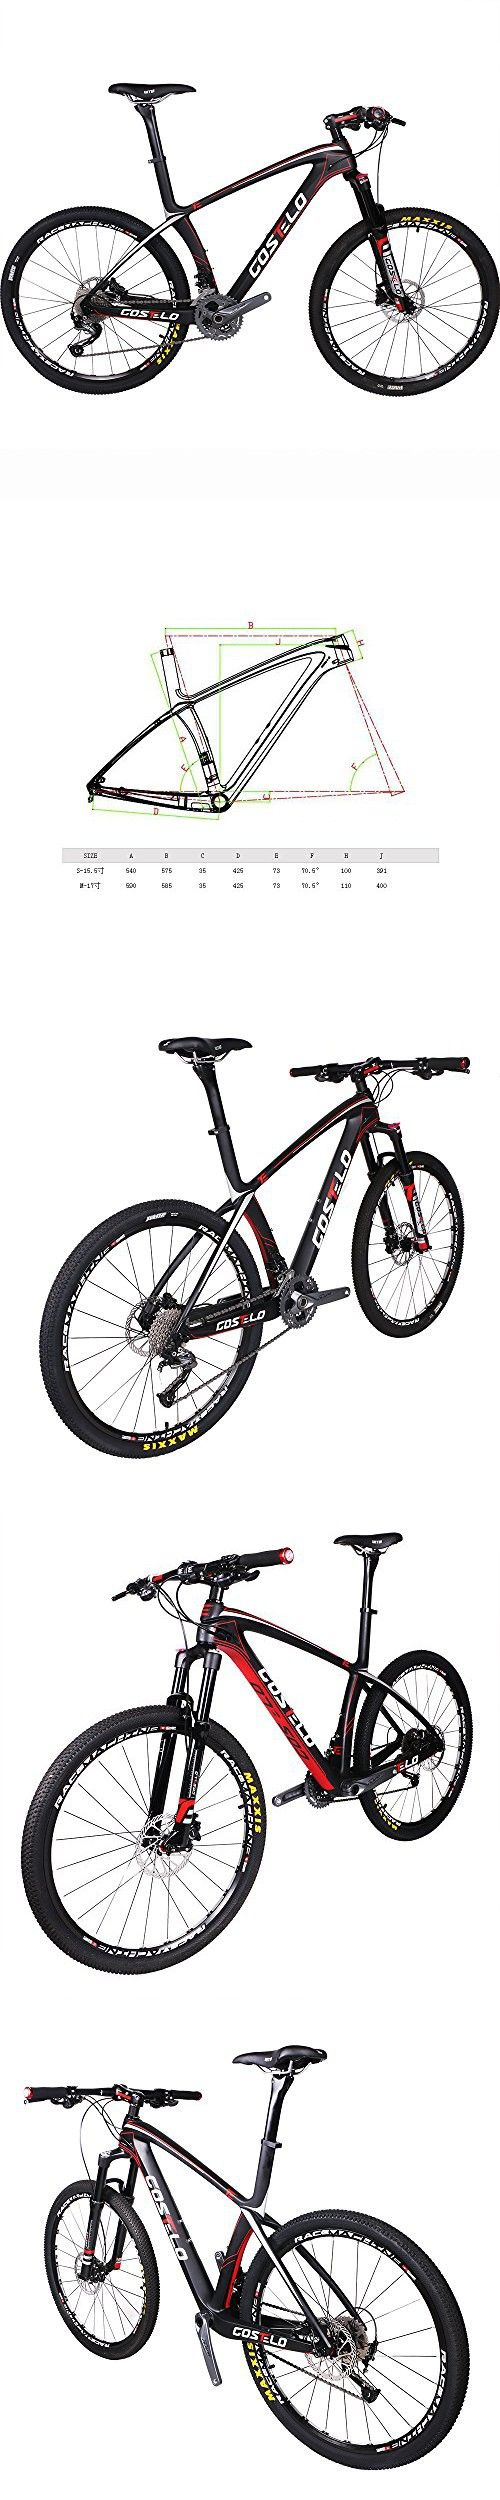 Costelo Ultimate 9.9 Bicycle MTB Frame carbon Bicylce Mountain Bike 27.5 650B MTB Frame Original Groups Wheels Saddle Bar Tire (SHIMANO M610)